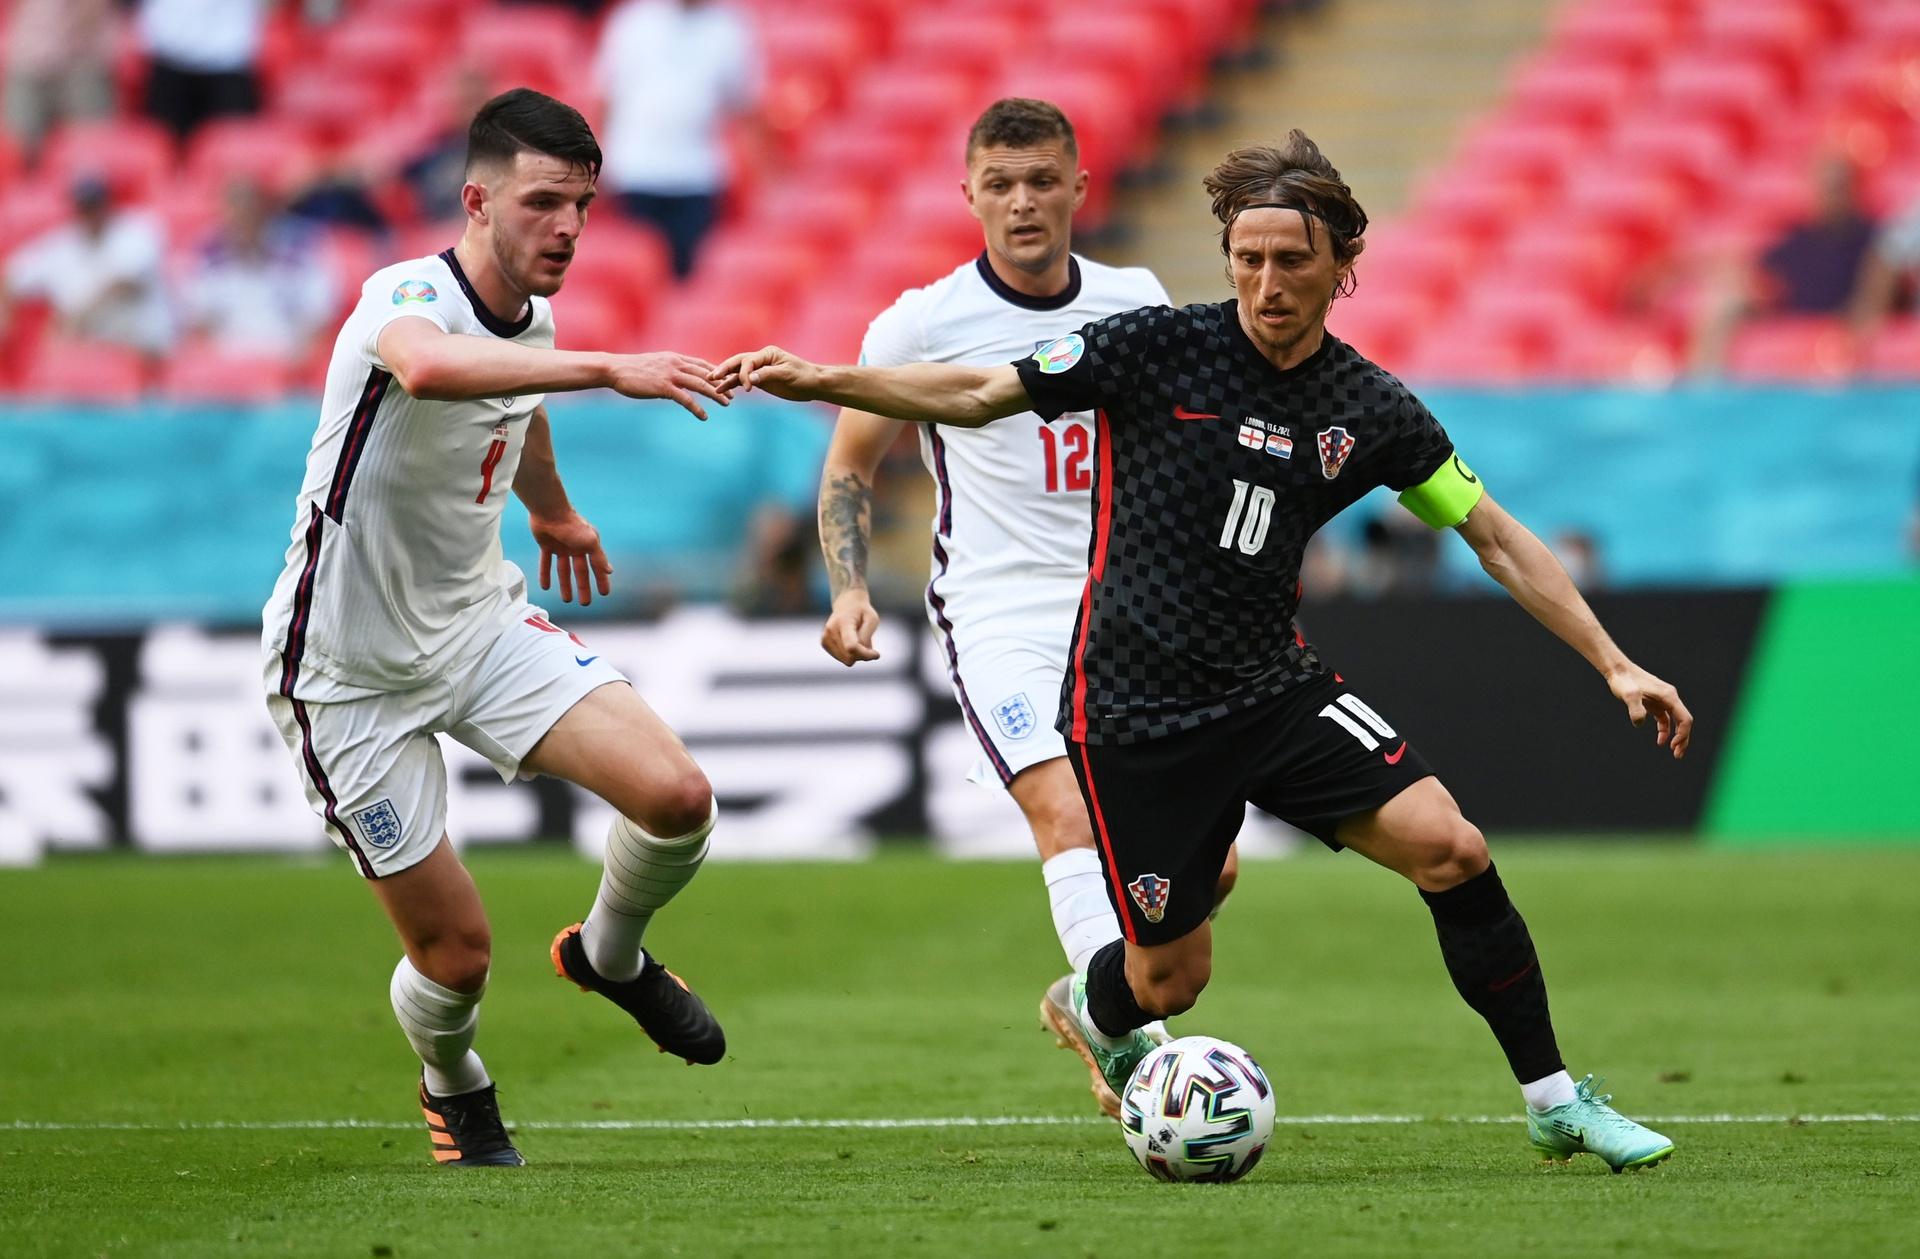 Croatia vs Scotland: Fixtures, match schedule, TV channels and live stream